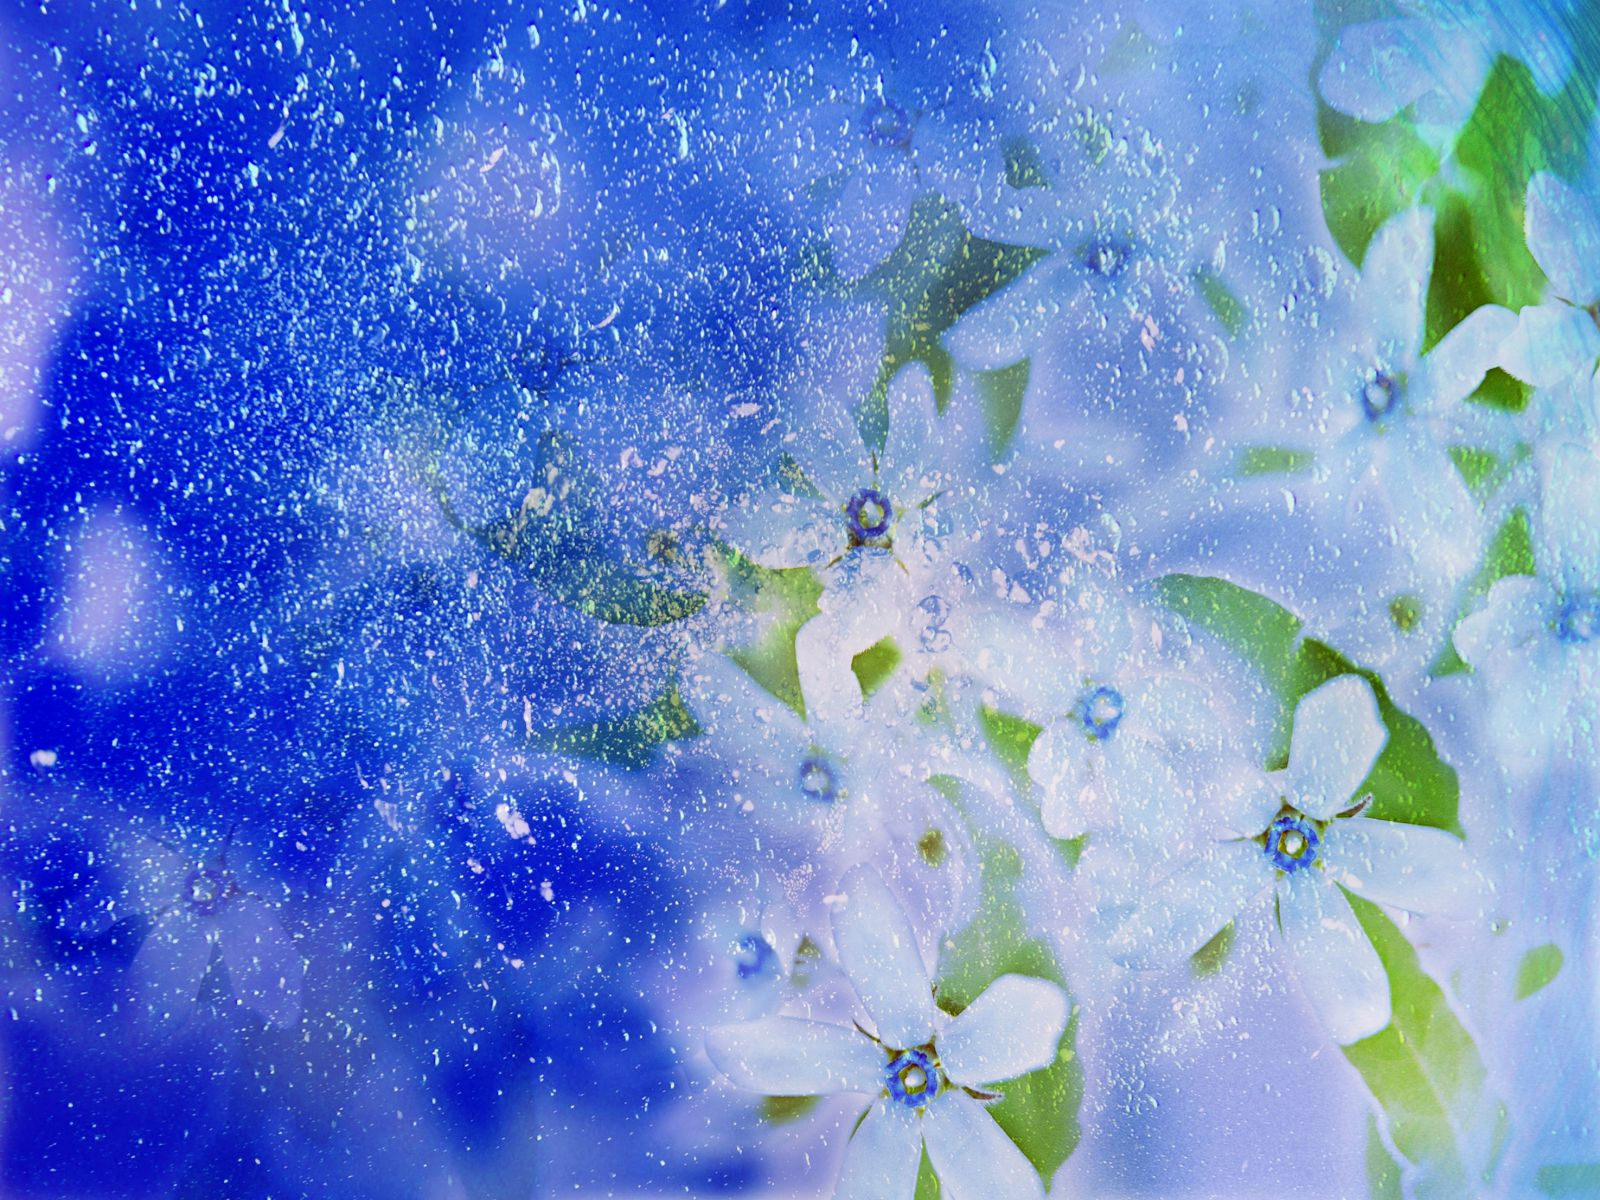 http://4.bp.blogspot.com/-JJZCt6wy6Bw/TaiunJQd9iI/AAAAAAAAGiA/6N1p-7WoISs/s1600/1290068800_1600x1200_beautiful-winter-flower.jpg